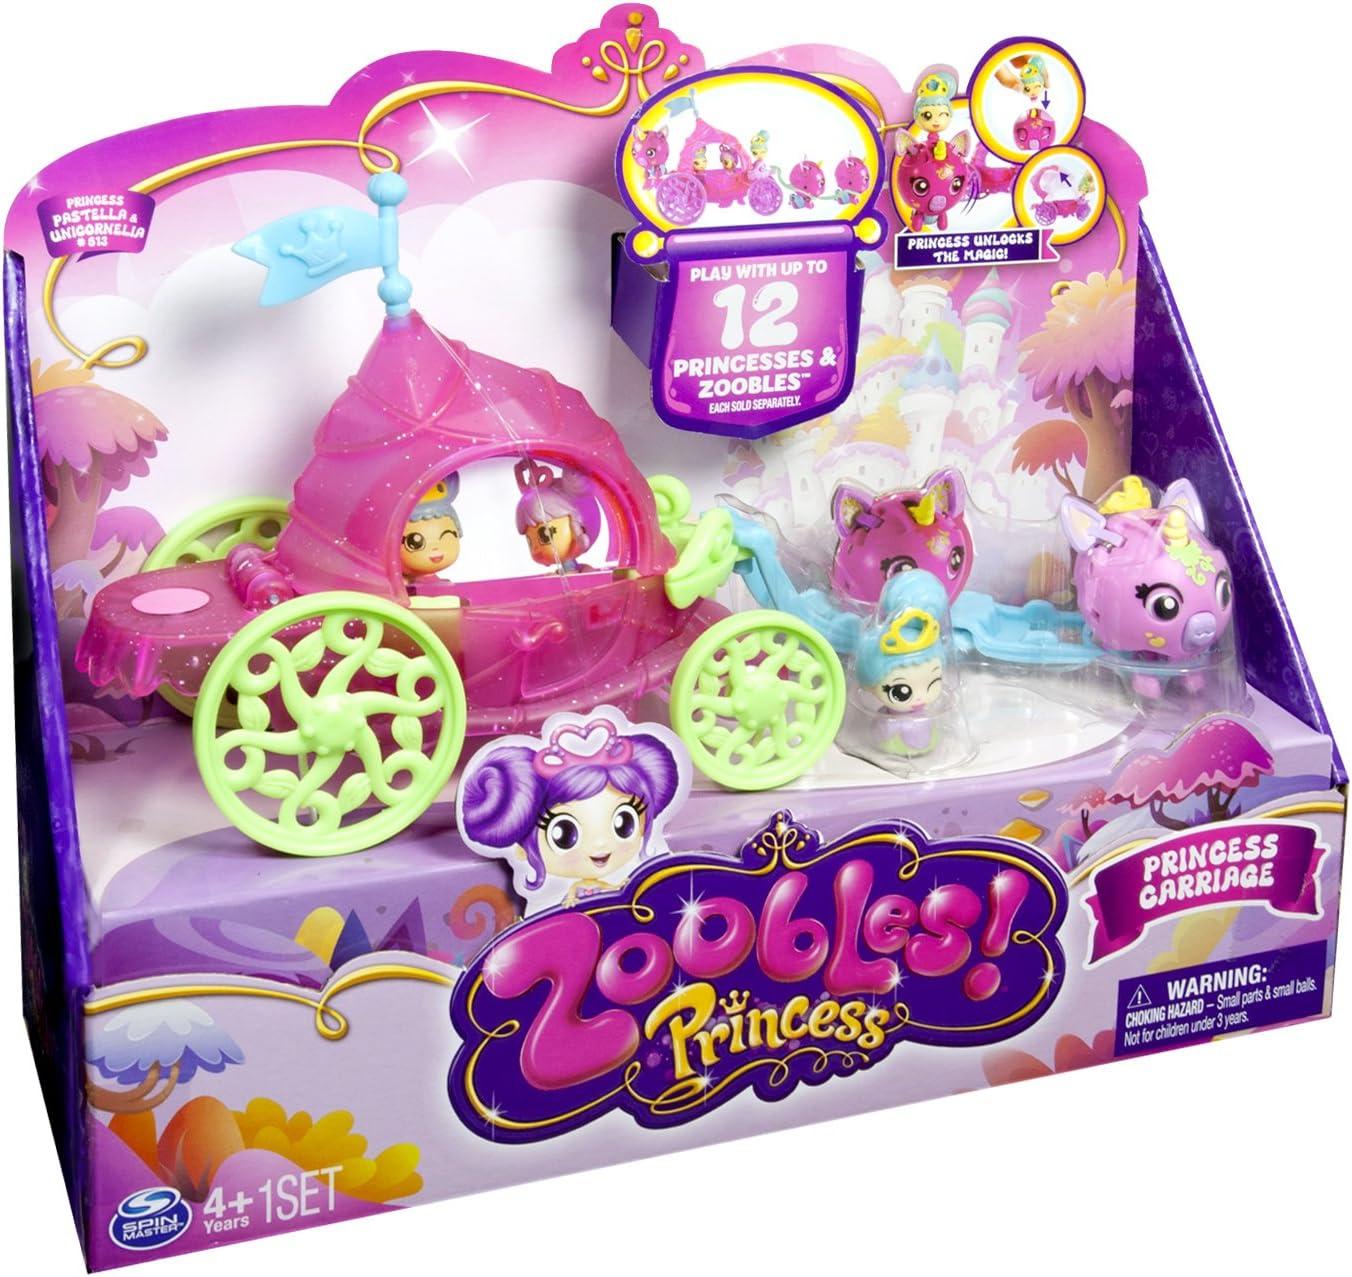 Zoobles Princess carriage Mini Play Set